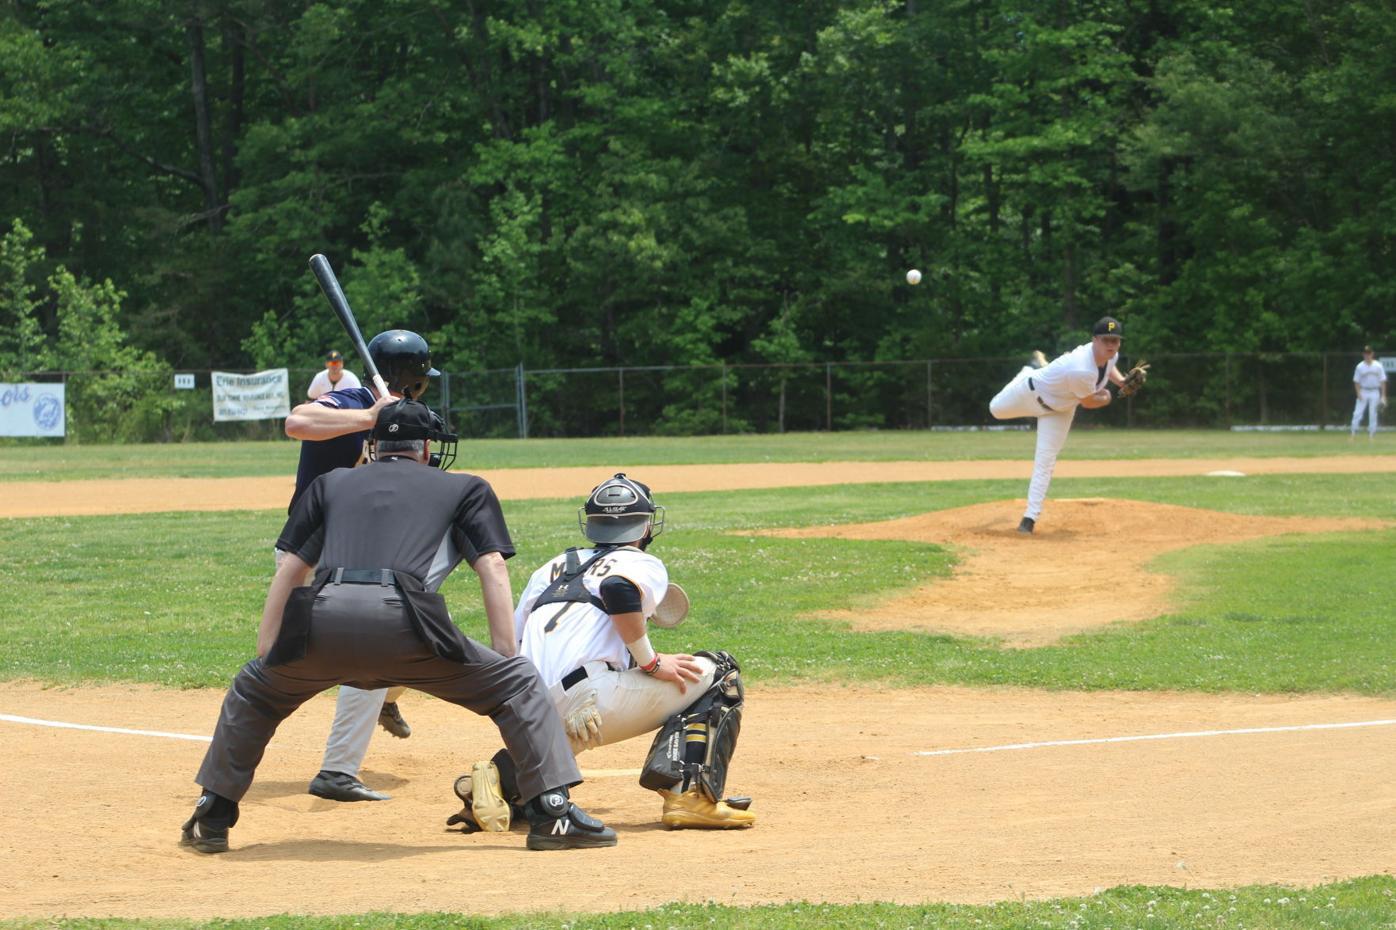 CHASM baseball kicks off 75th season